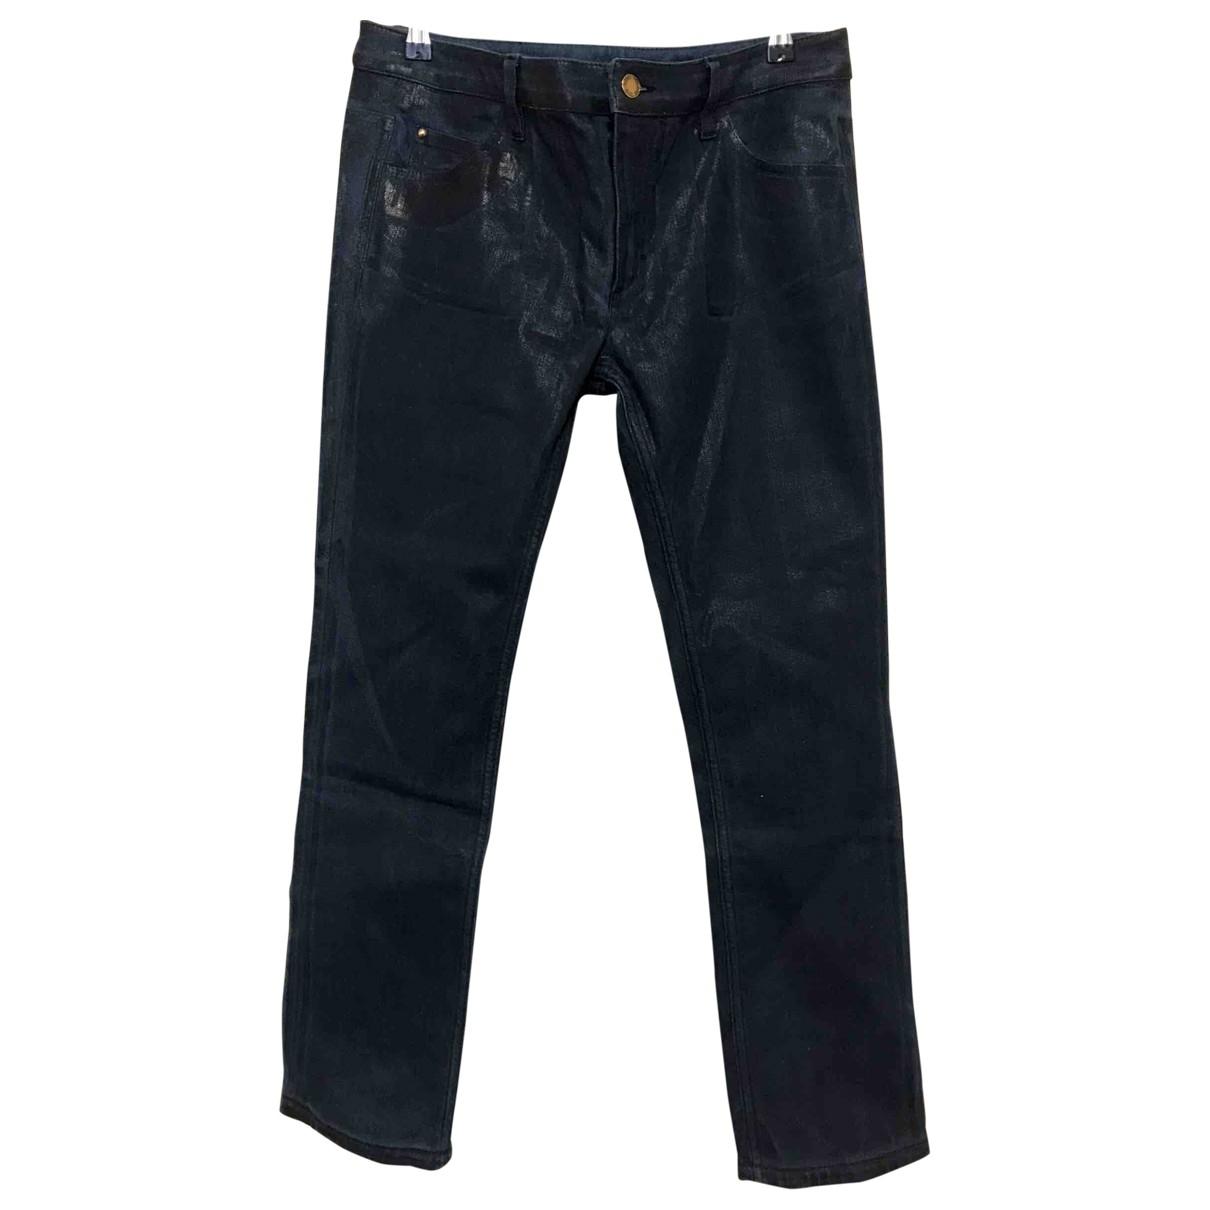 Louis Vuitton \N Blue Cotton - elasthane Jeans for Women 42 FR